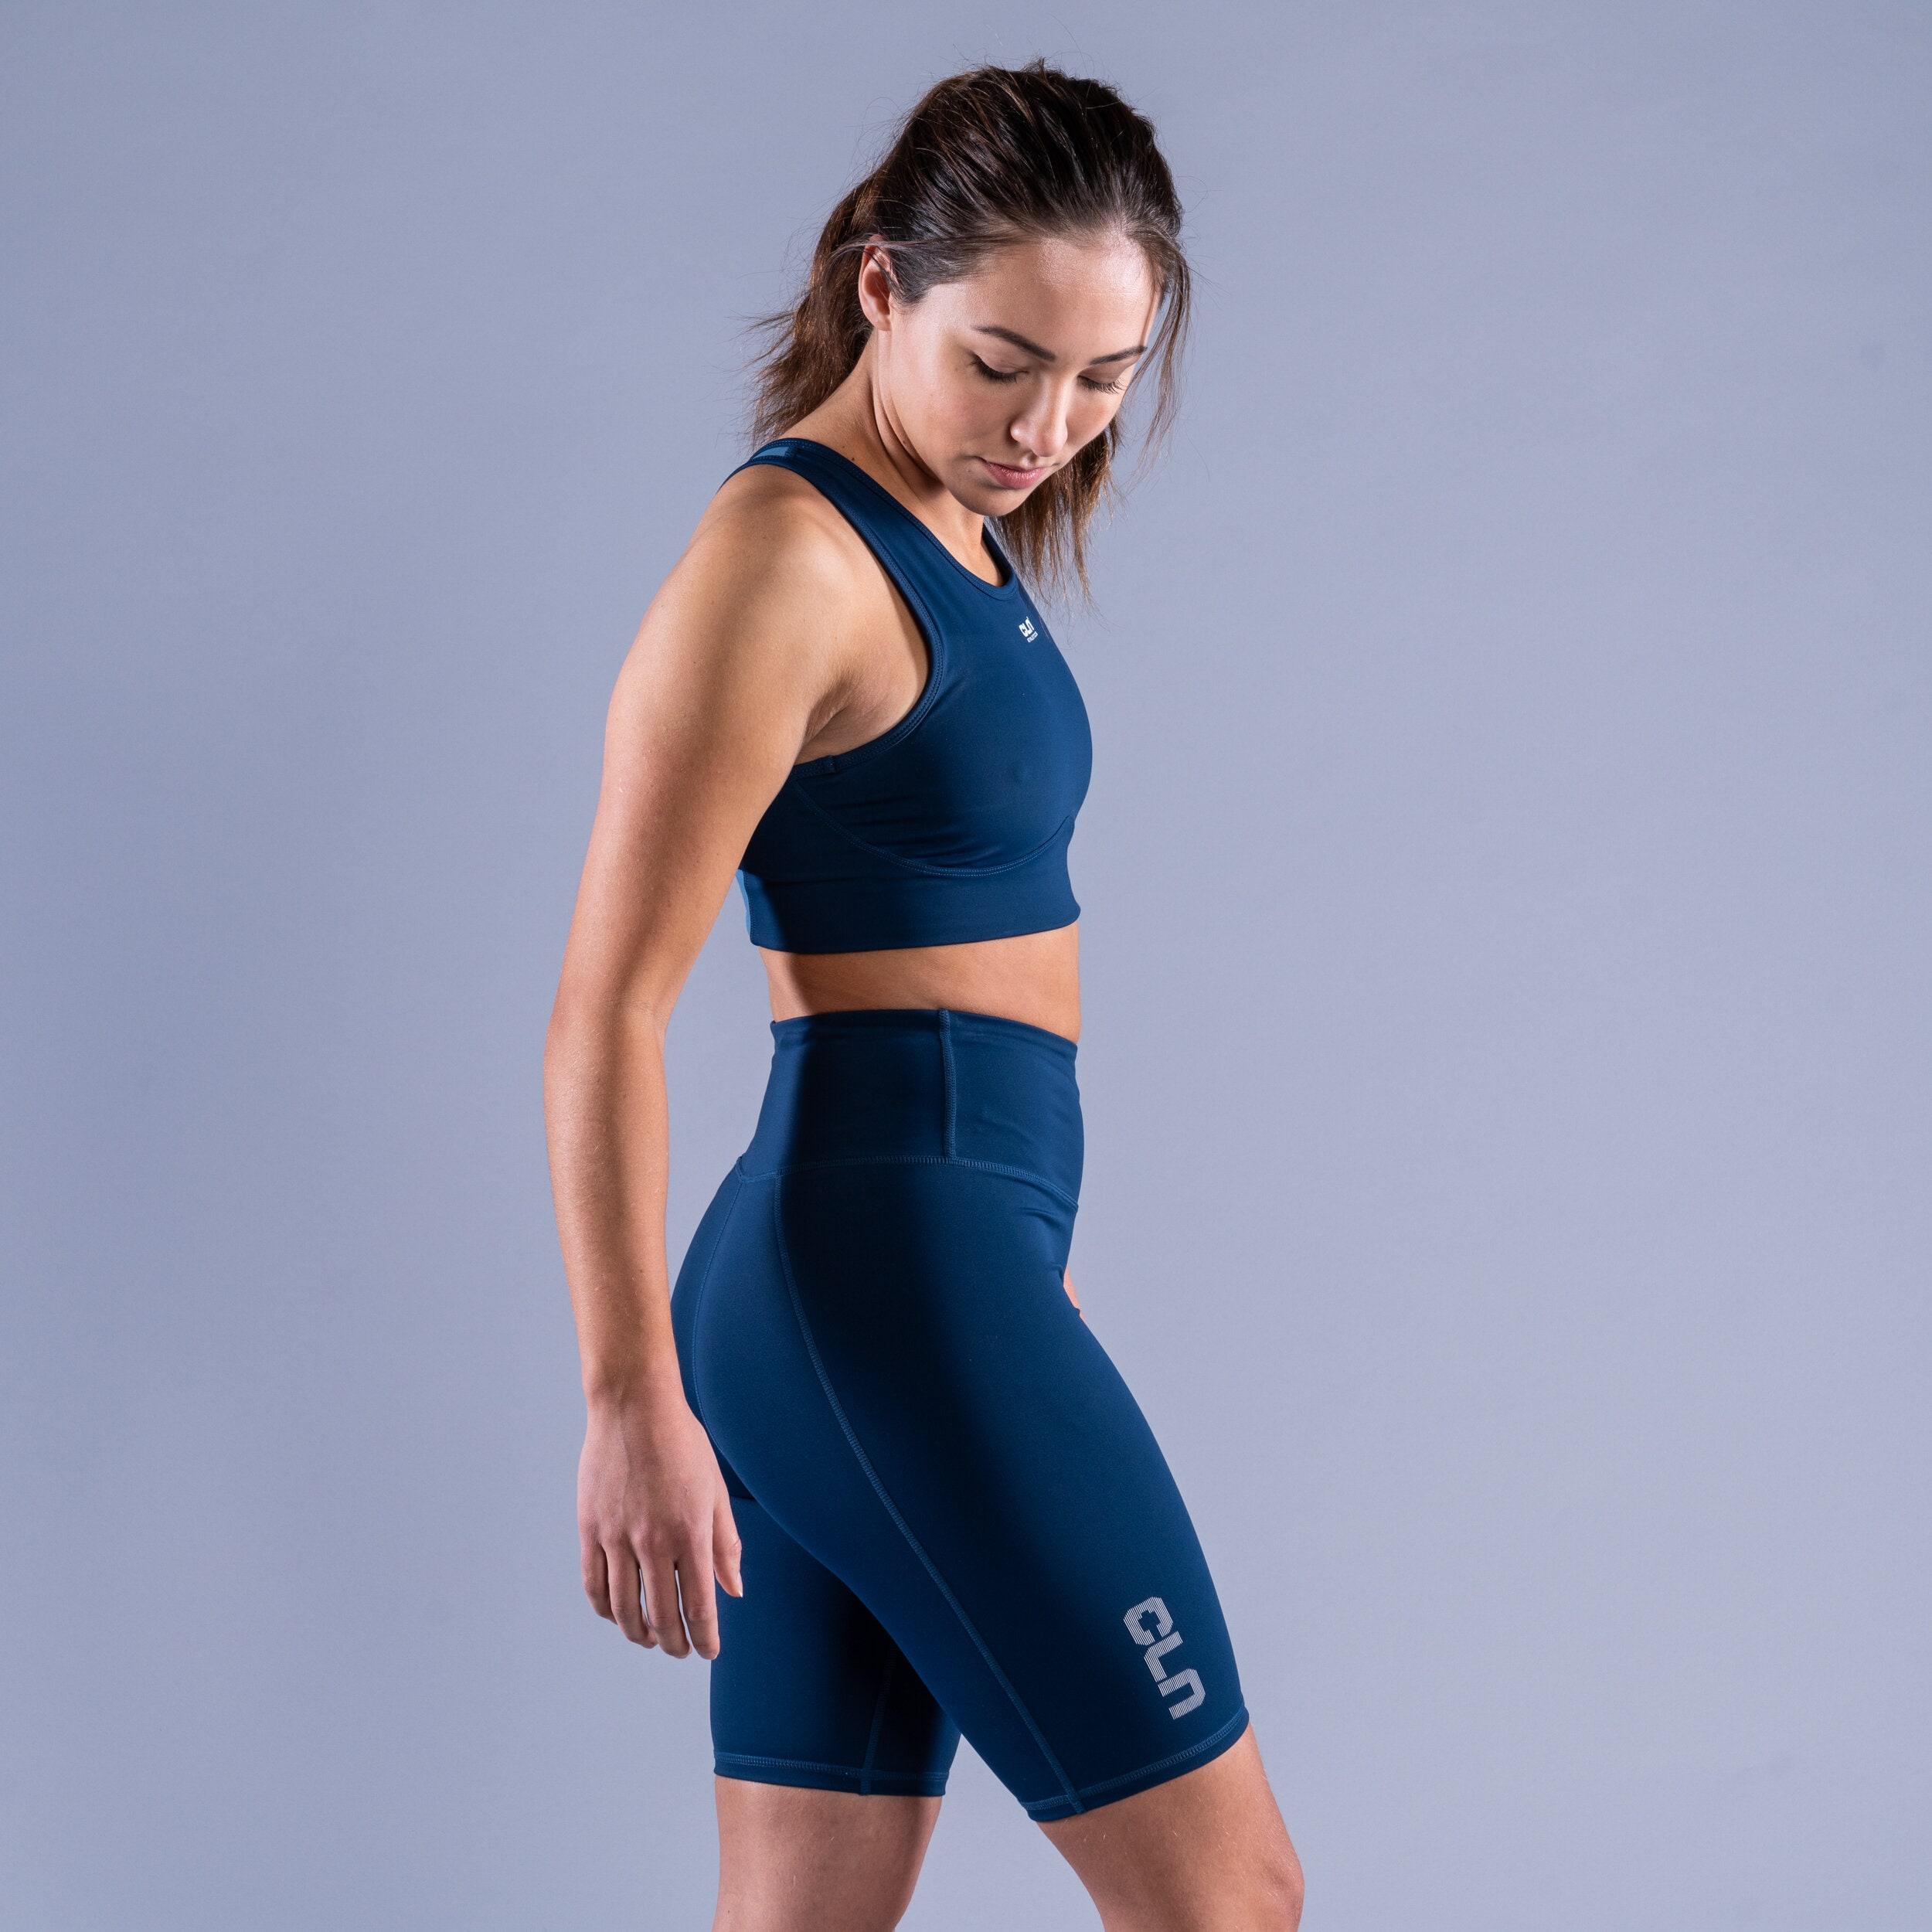 CLN Intense sport bra Titan blue